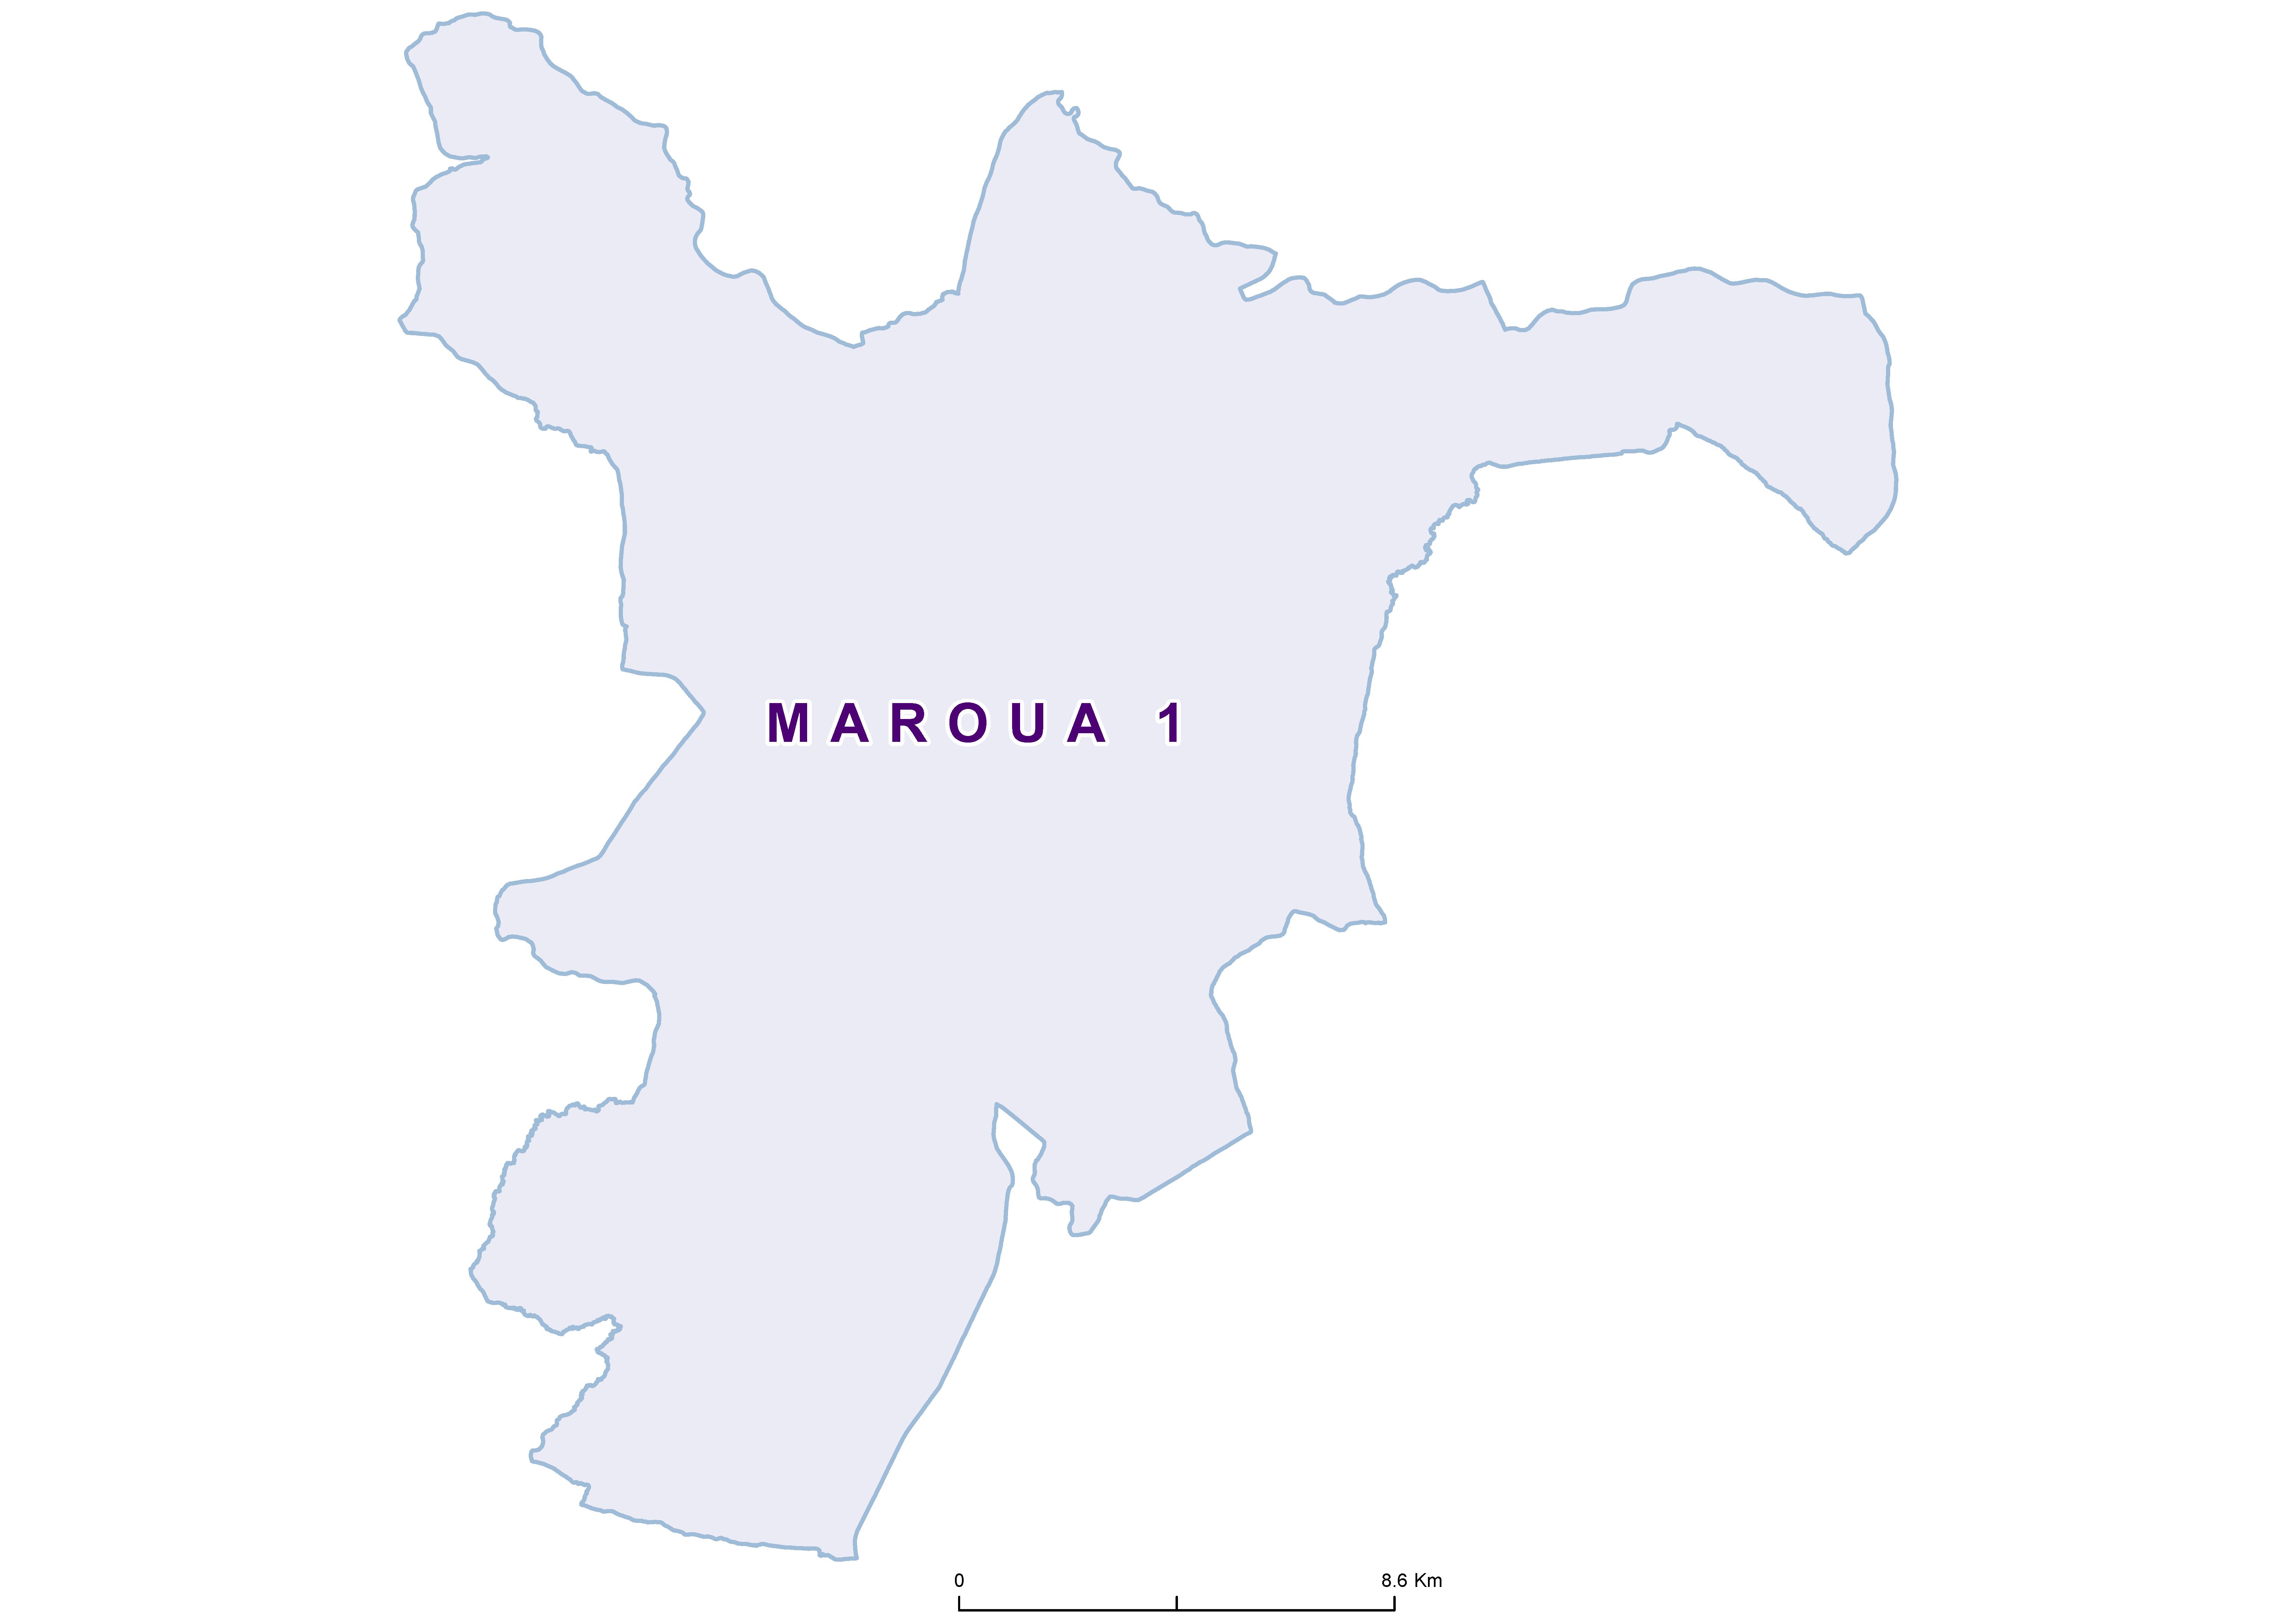 Maroua 1 Mean SCH 20180001